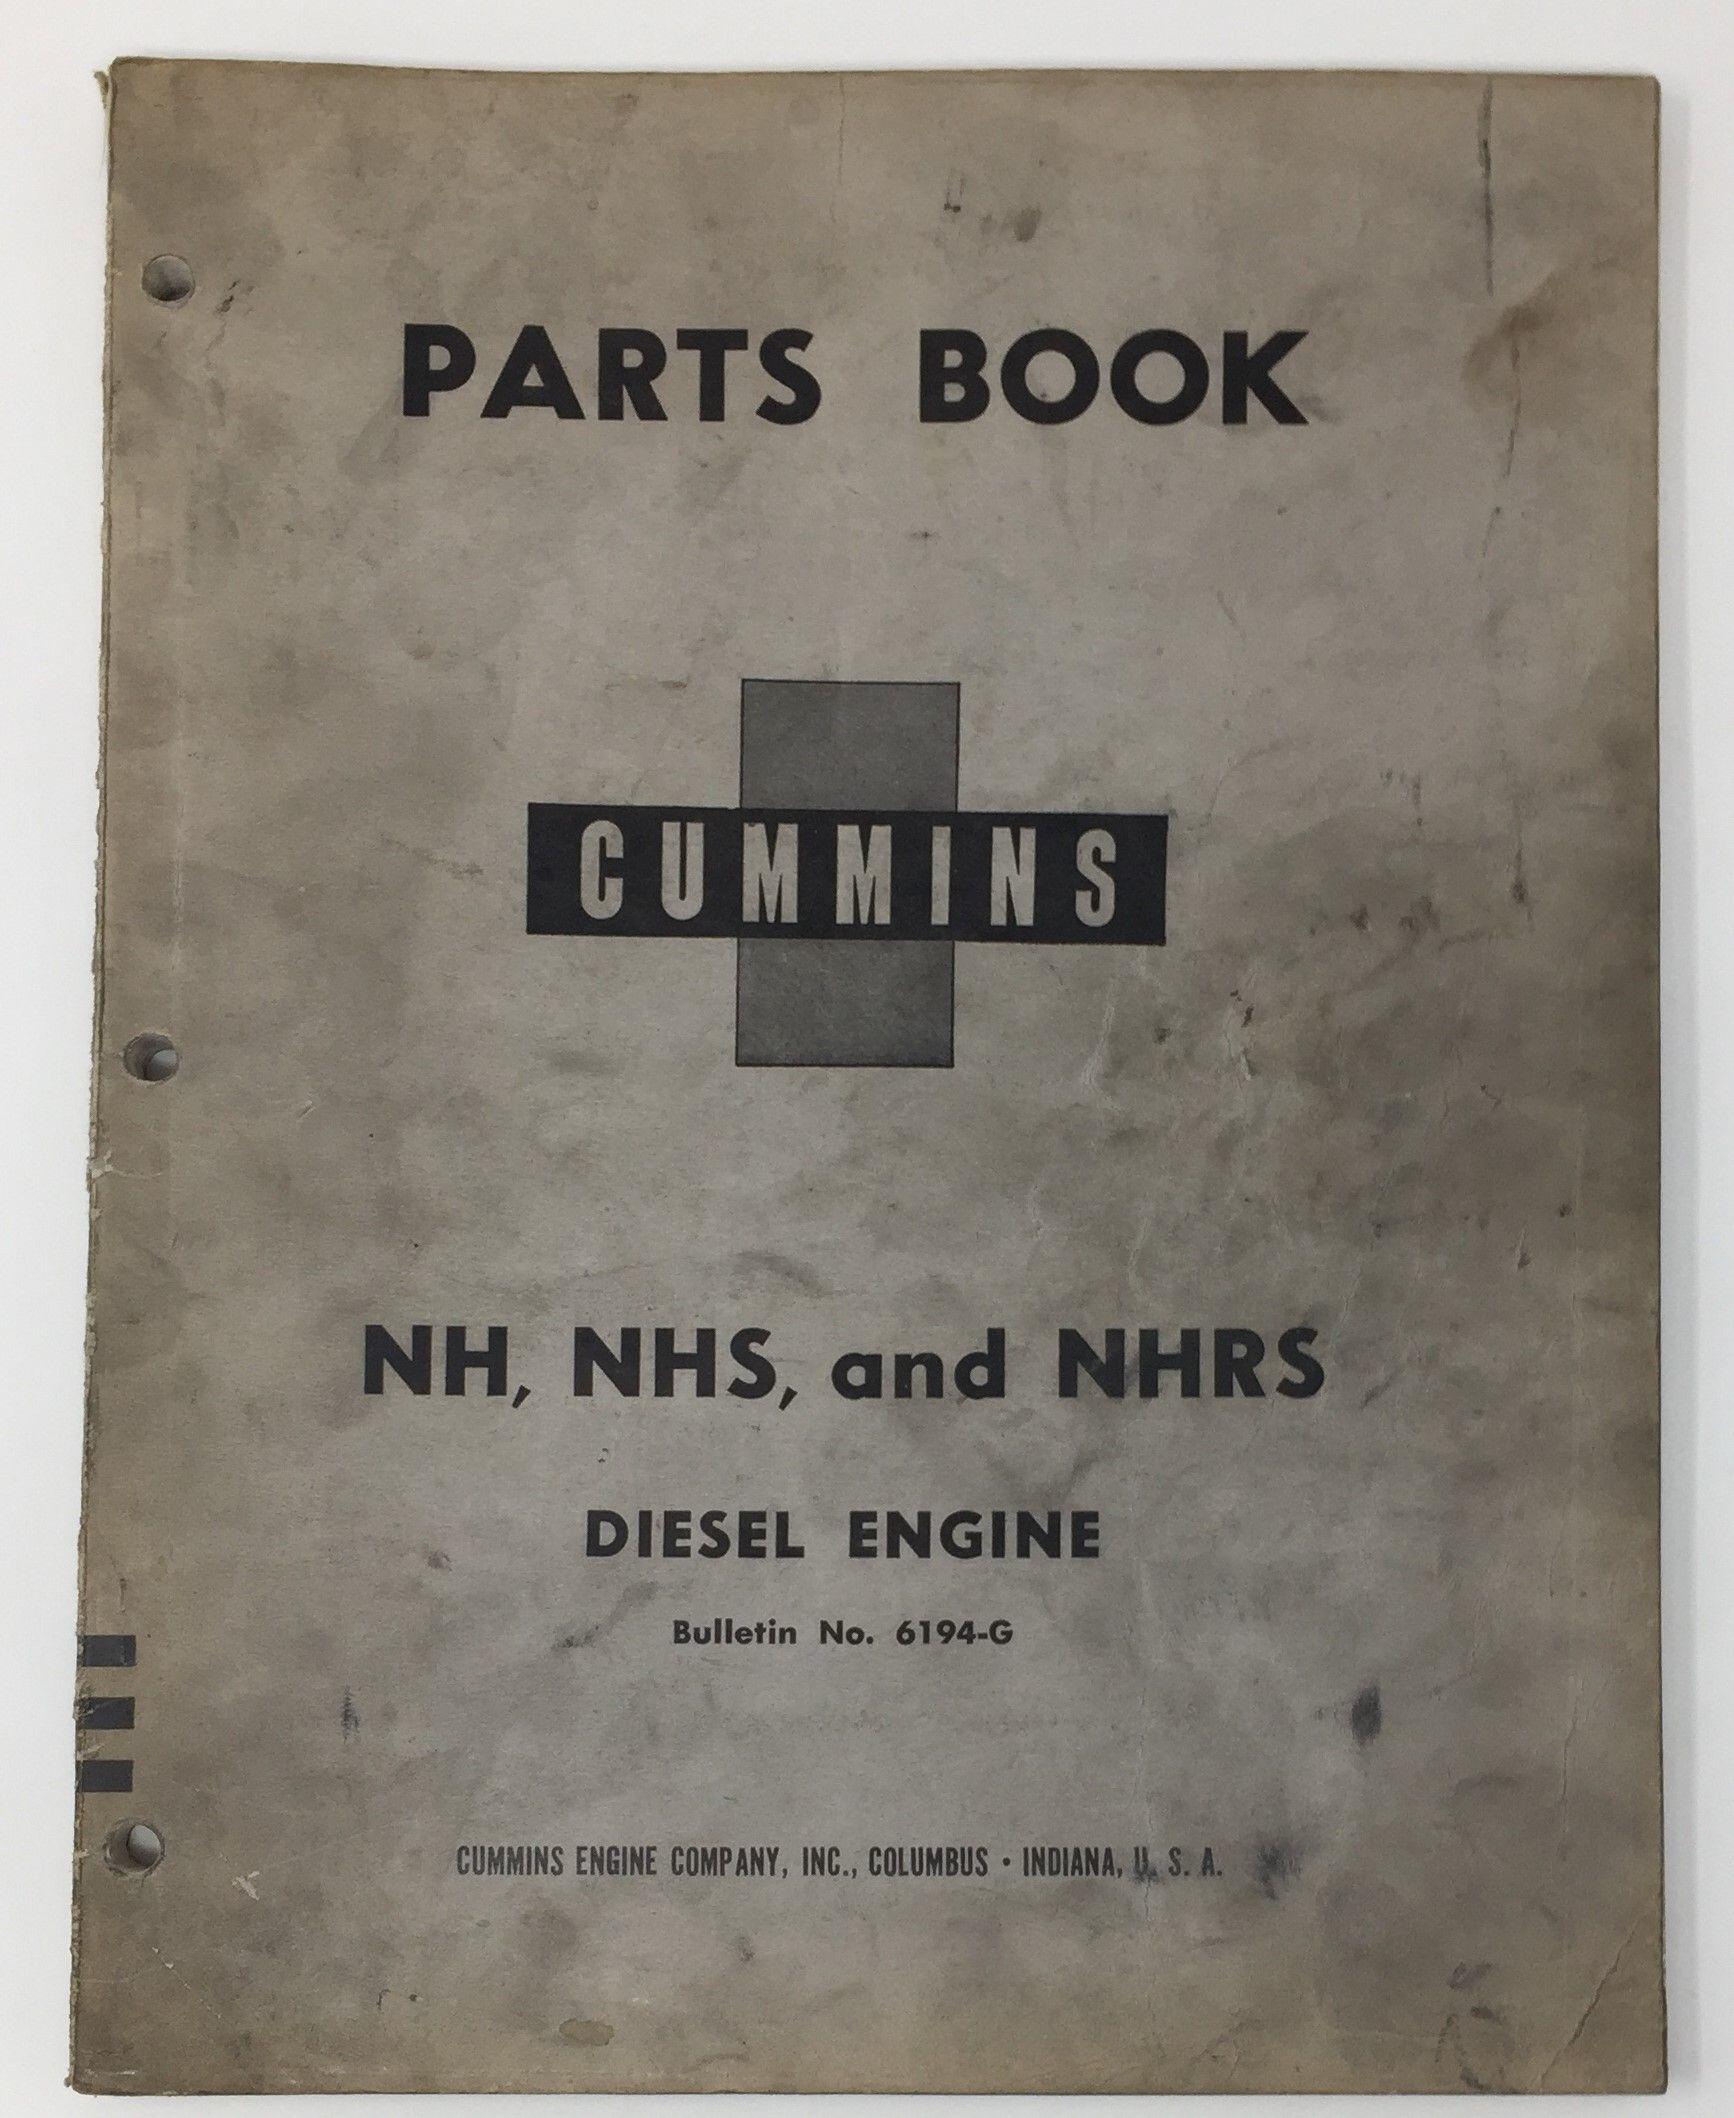 Cummins Nh Nhs Nhrs Diesel Engine Parts Book 6194 G Diesel Engine Cummins Engineering